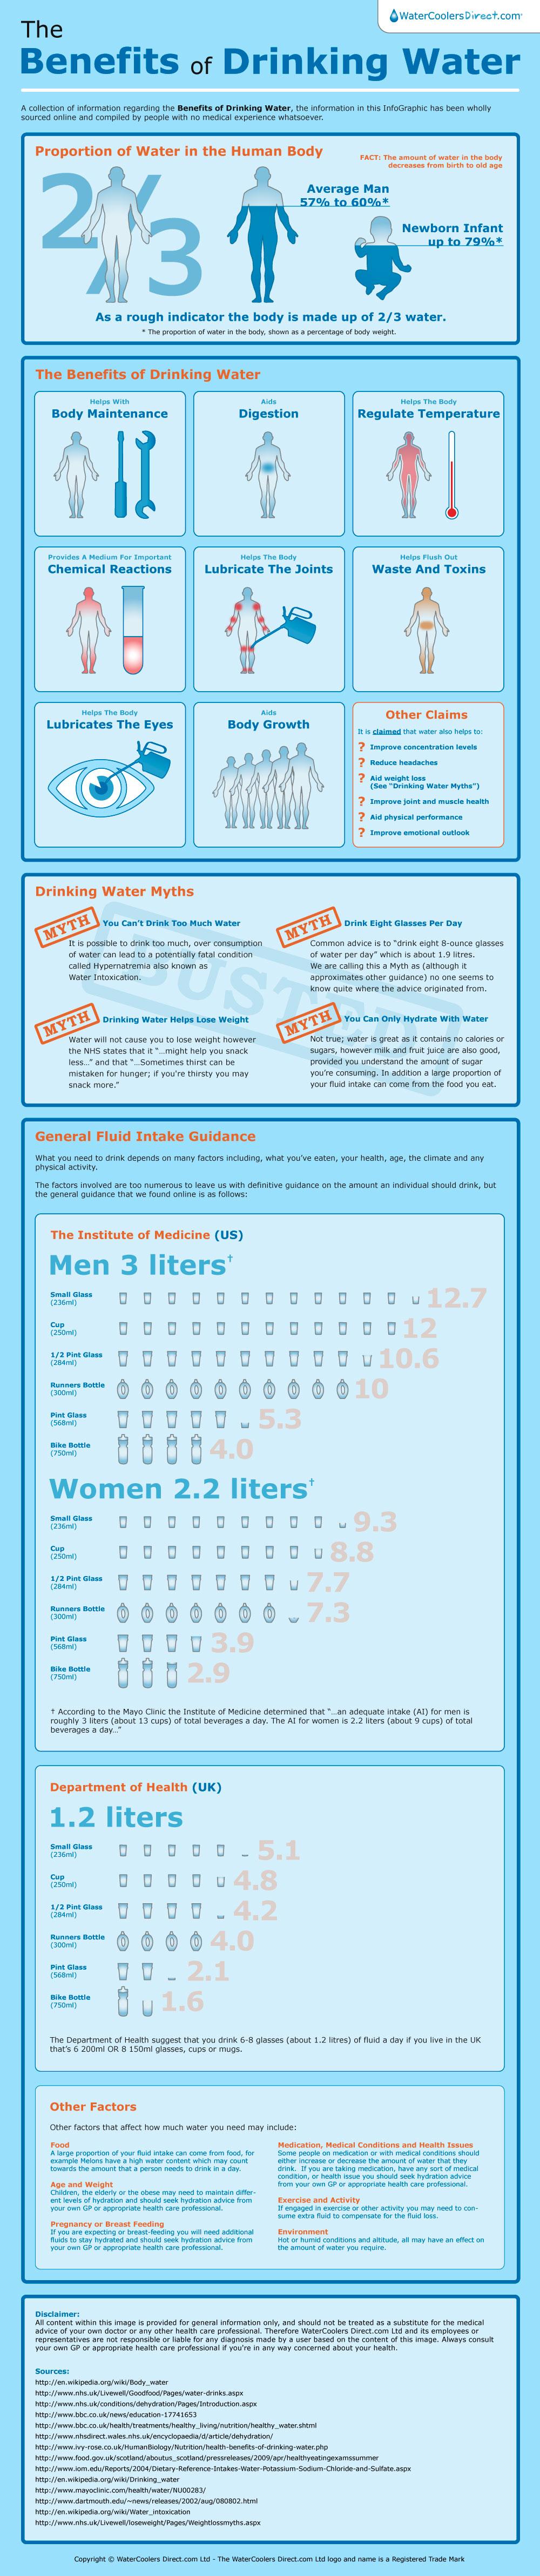 benefits-of-drinking-water_503903da714d4